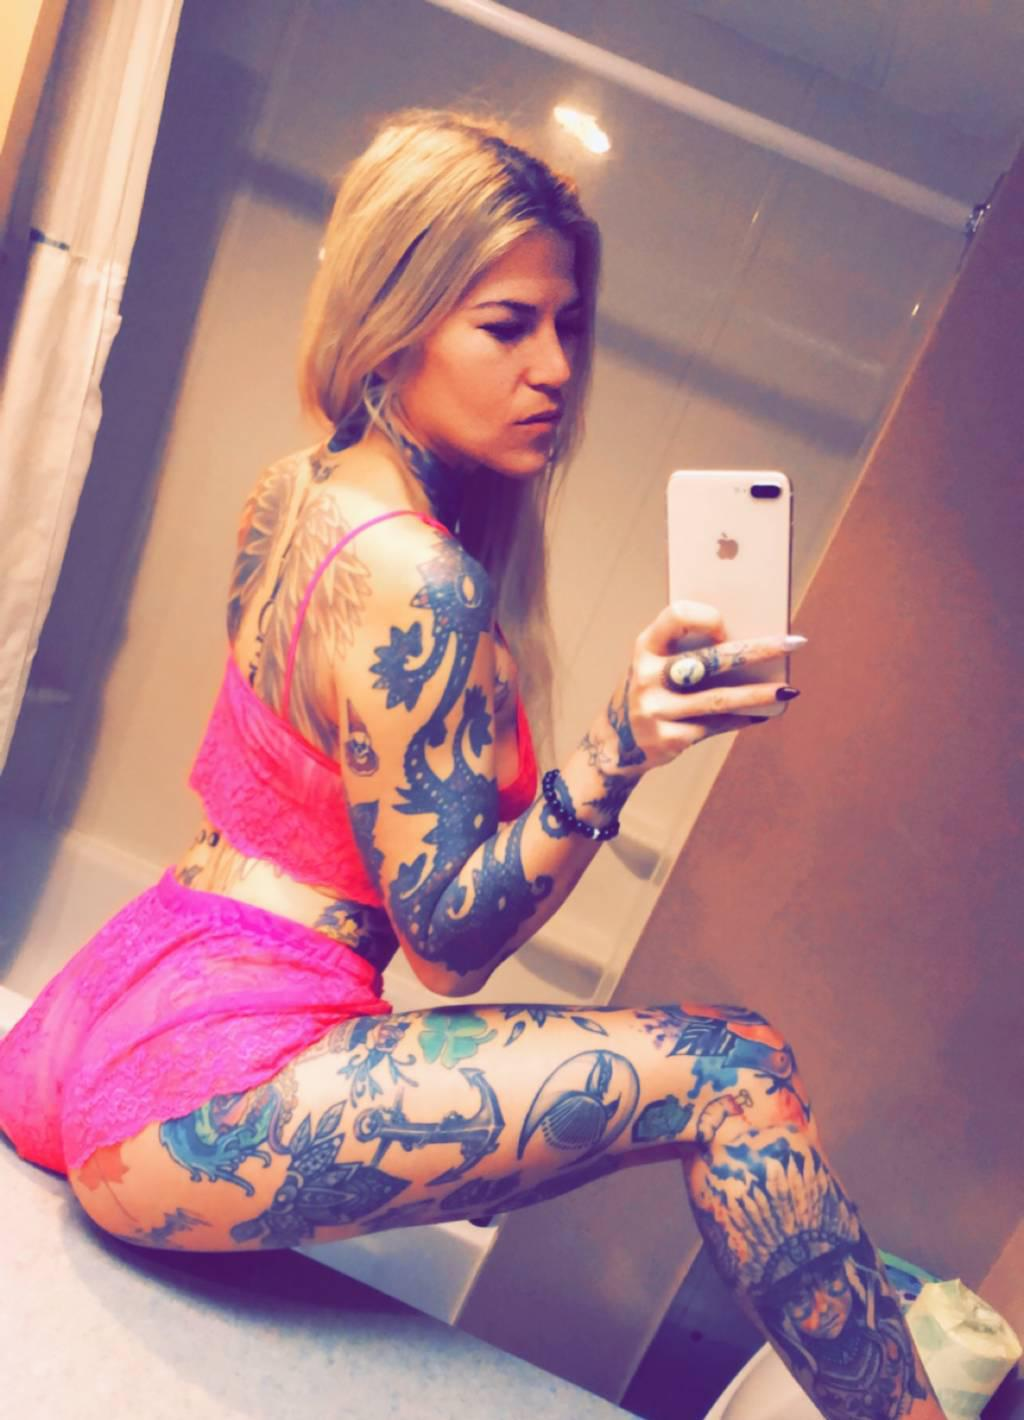 Kandy back in NANAIMO ,tattooed goddess